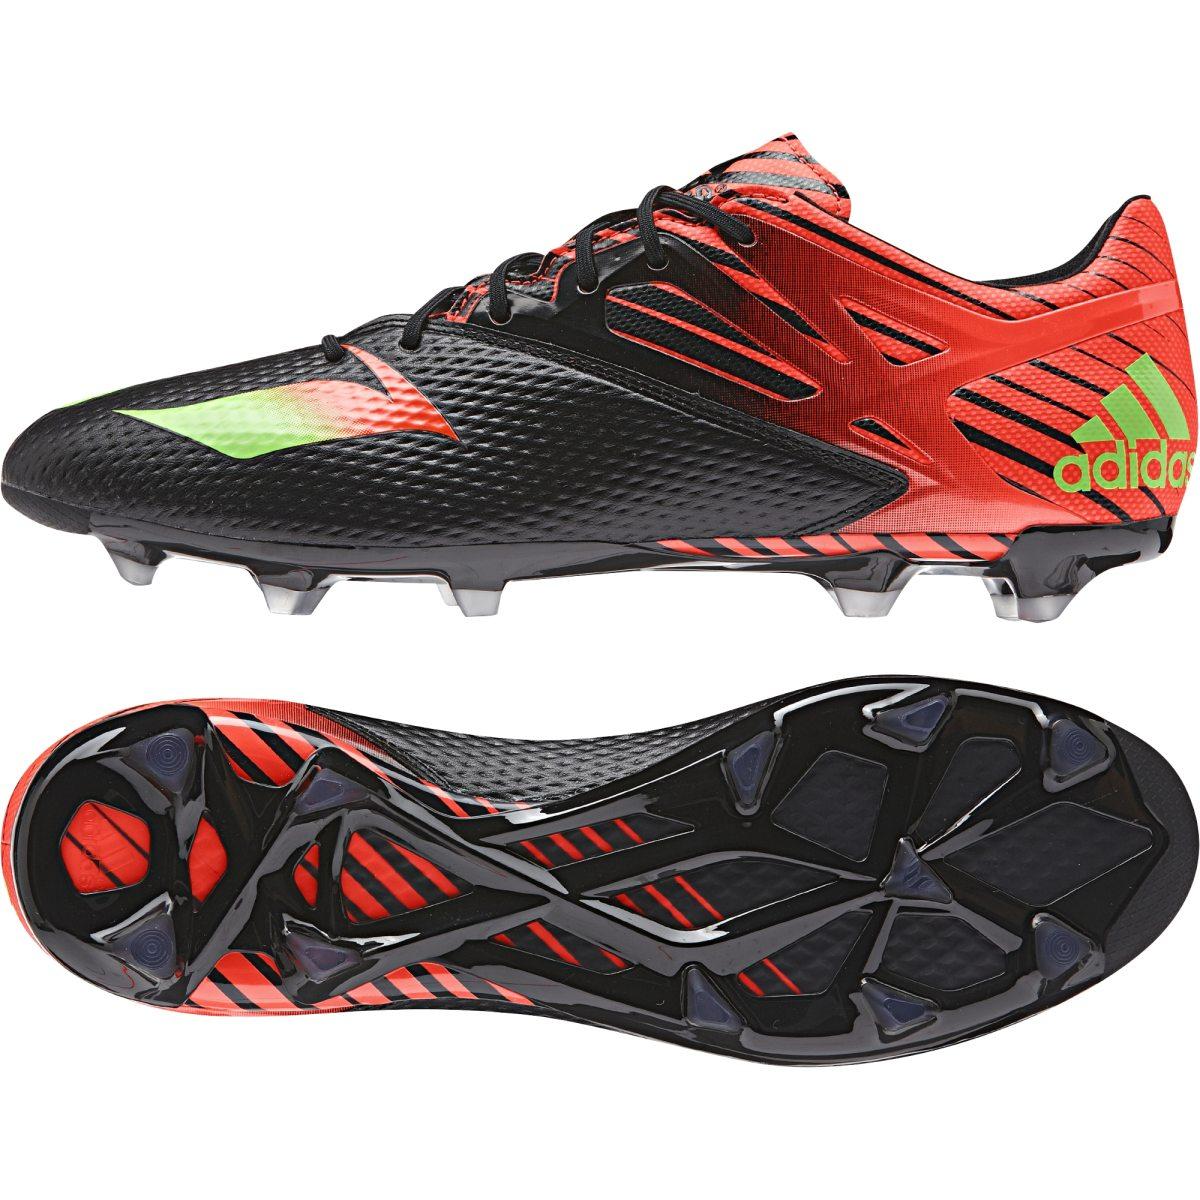 online retailer 6cf1f 80bc9 adidas messi 15.2 q1 16 fotbollssko senior fotbollsskor